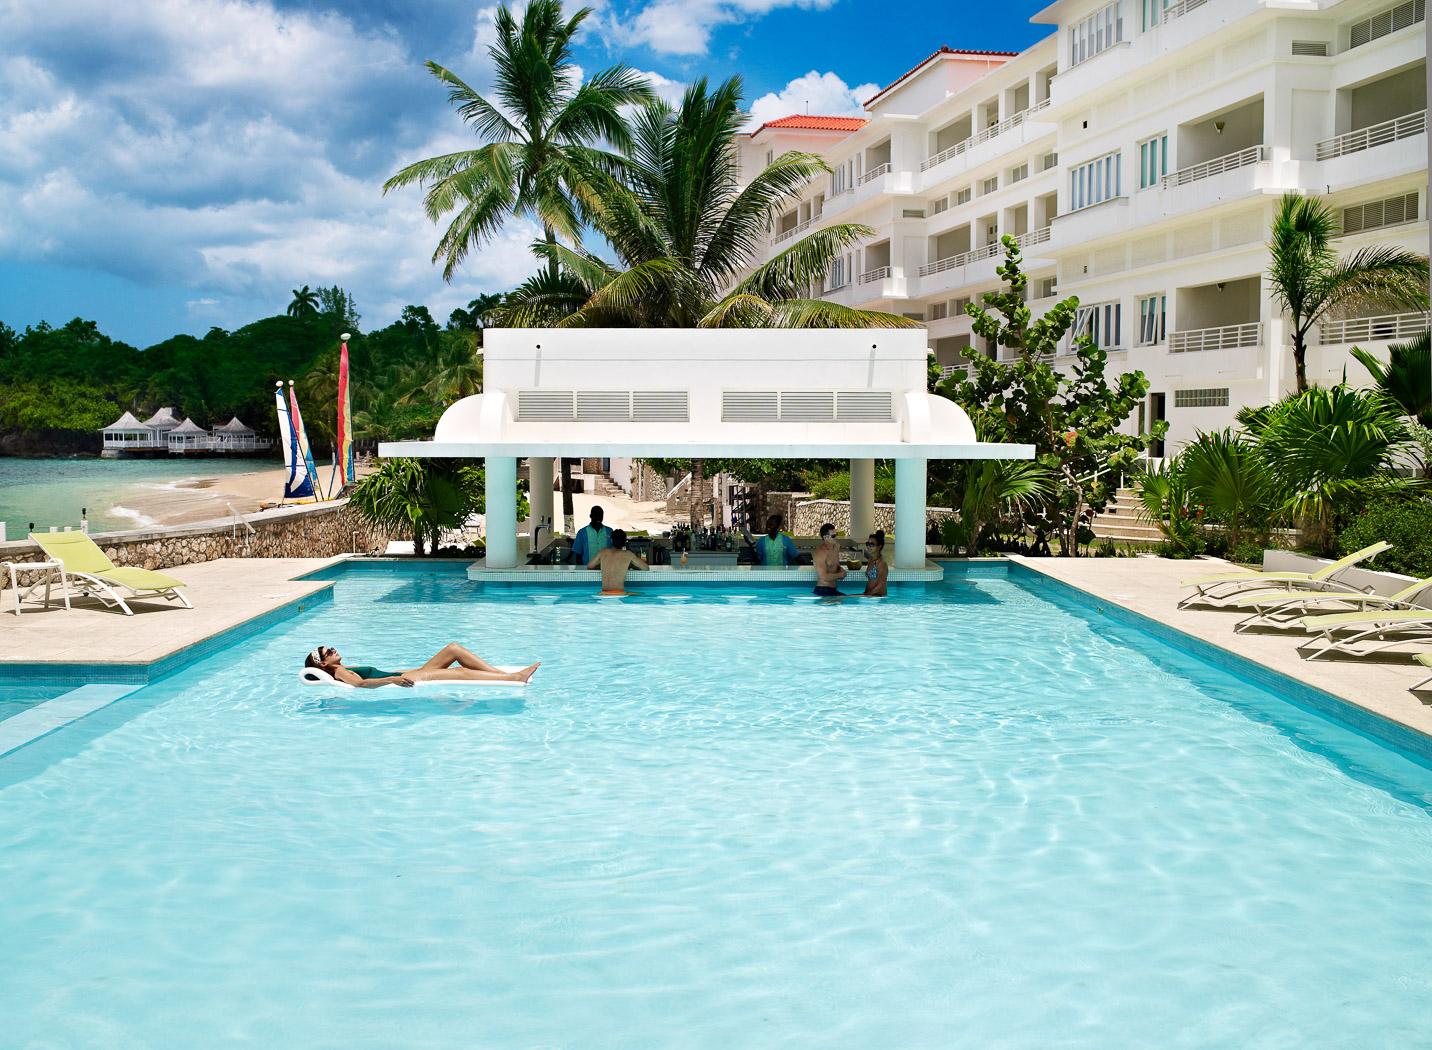 #1: Couples Tower Isle - Ocho Rios, Jamaica